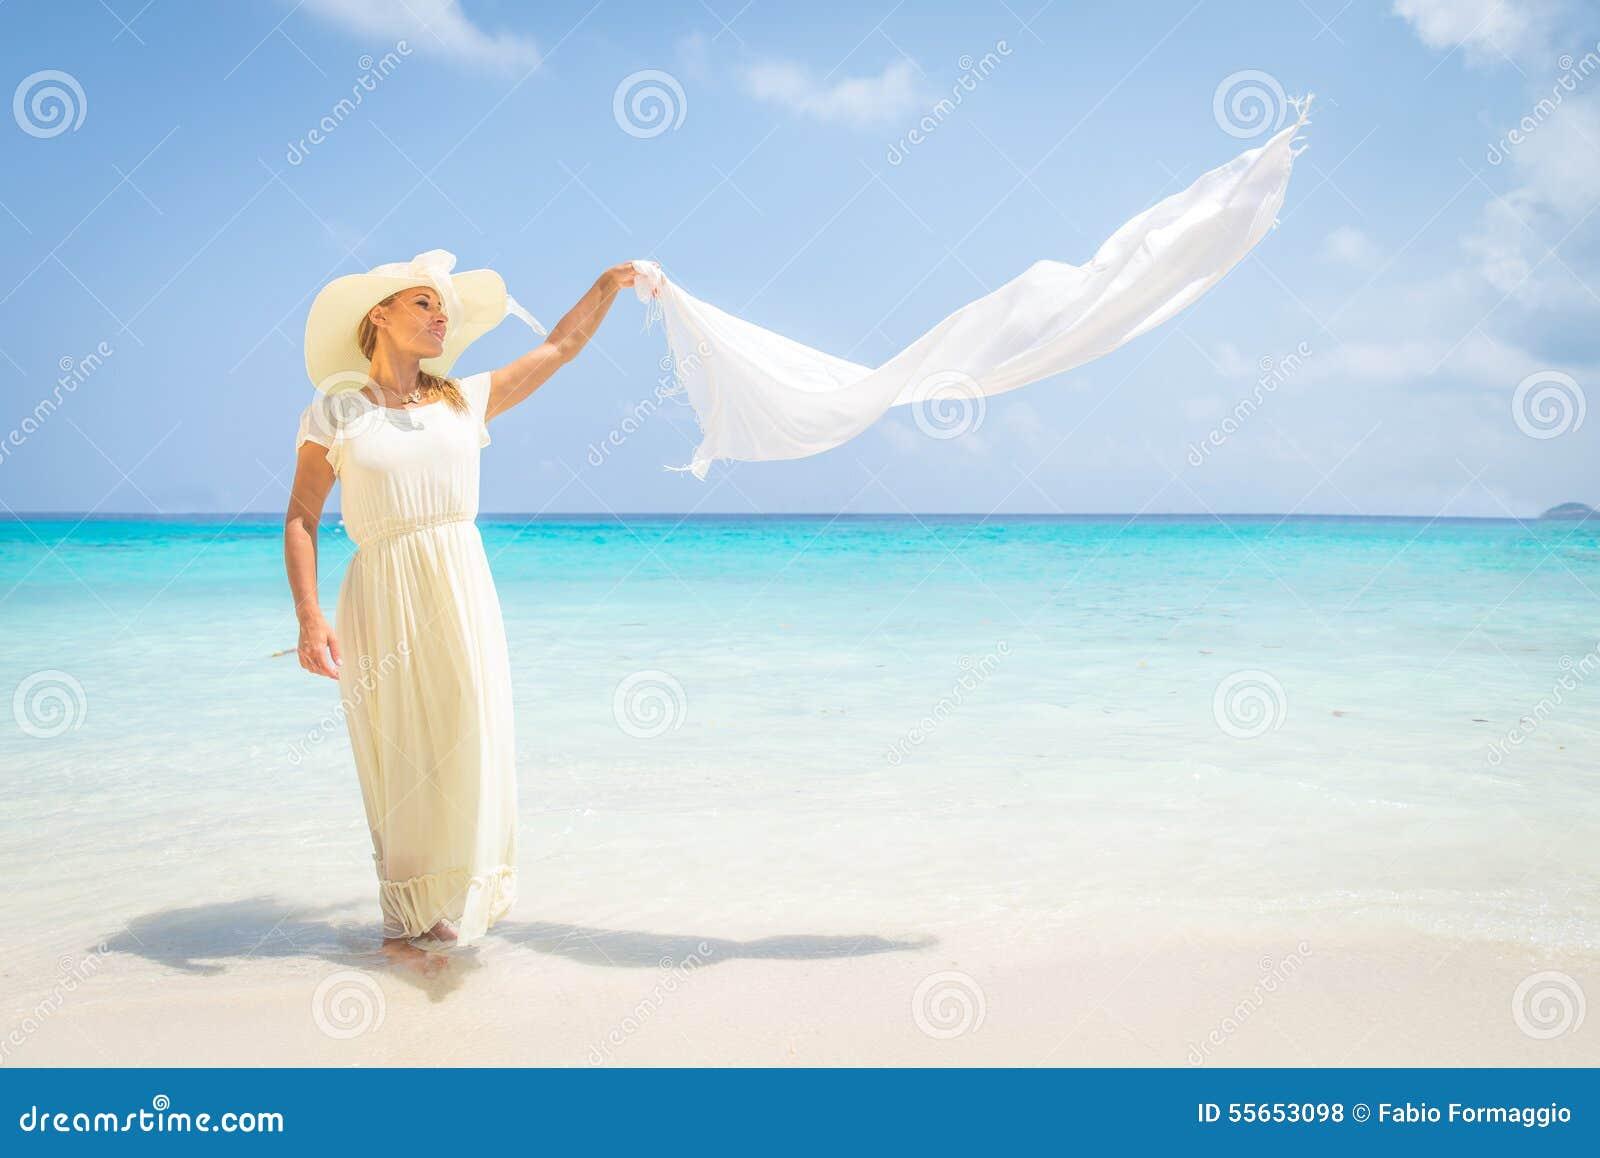 Moda model na tropikalnej plaży